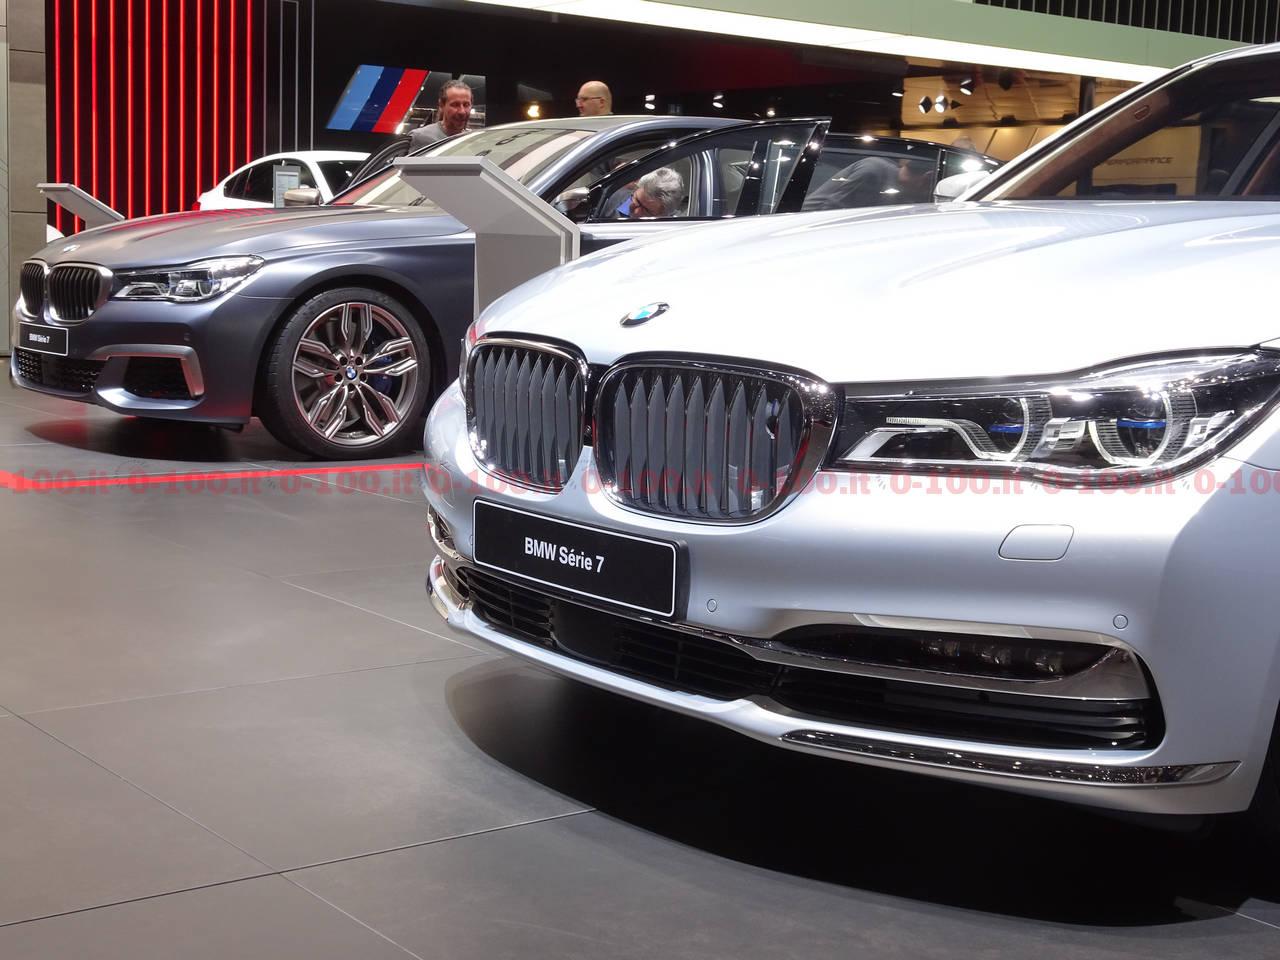 Ginevra-geneva-geneve-2017-BMW_Serie-7_0-100_3